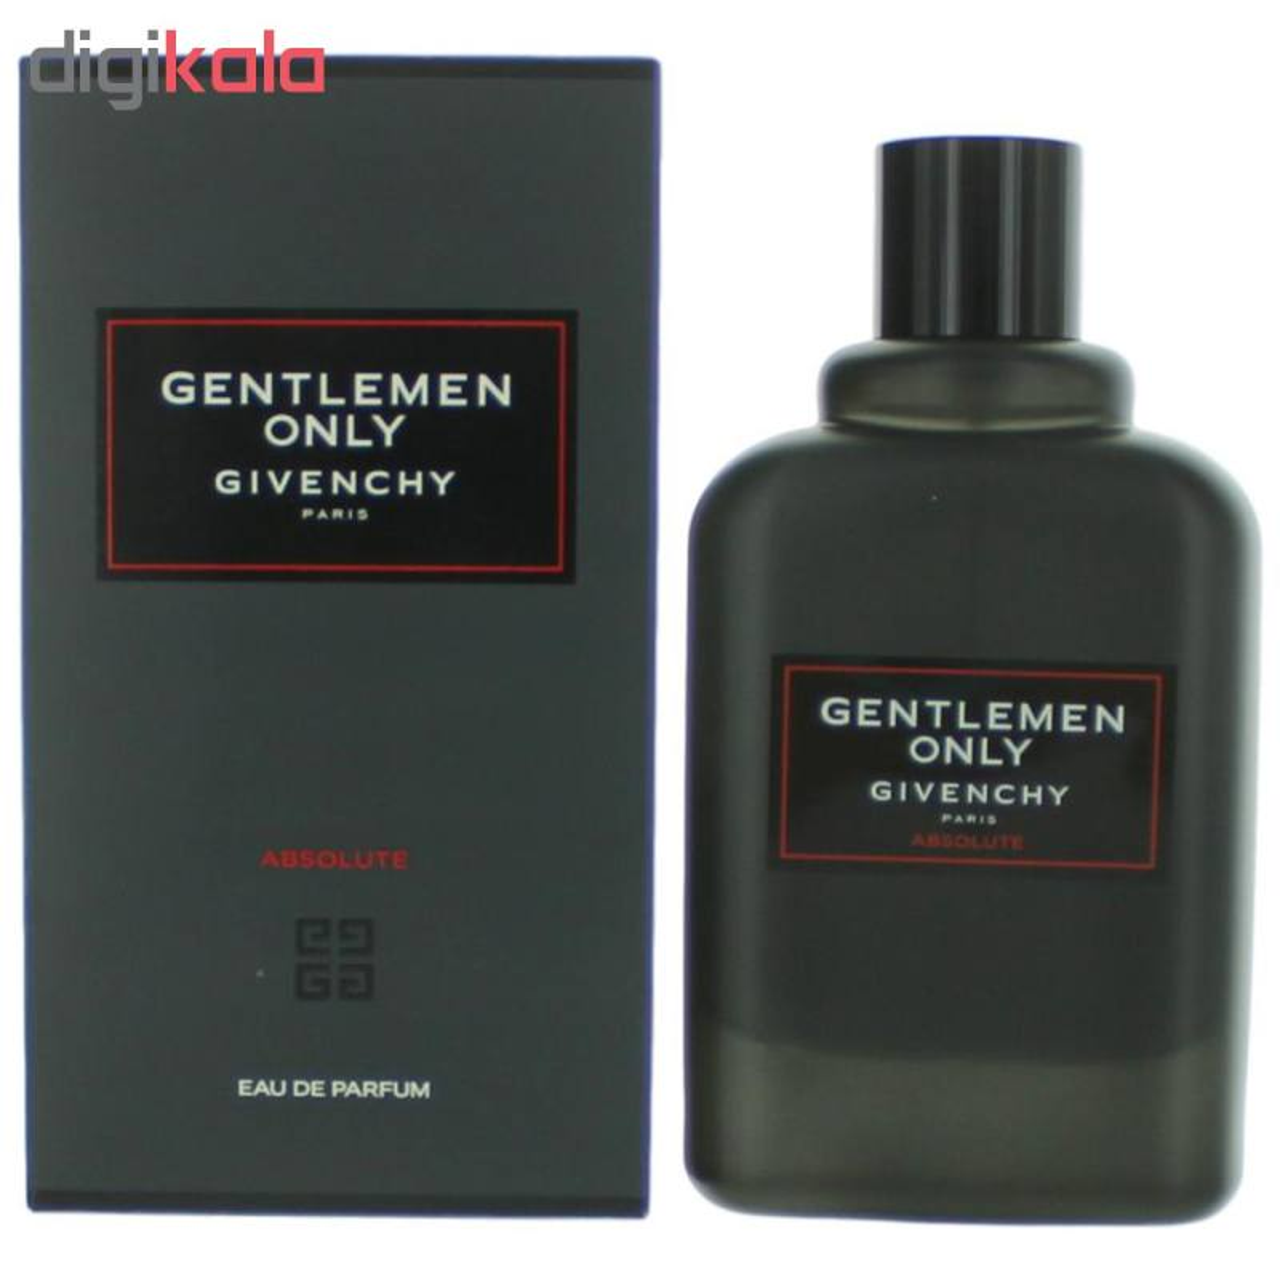 ادو پرفیوم مردانه ژیوانشی مدل Gentlemen Only حجم 100 میلی لیتر